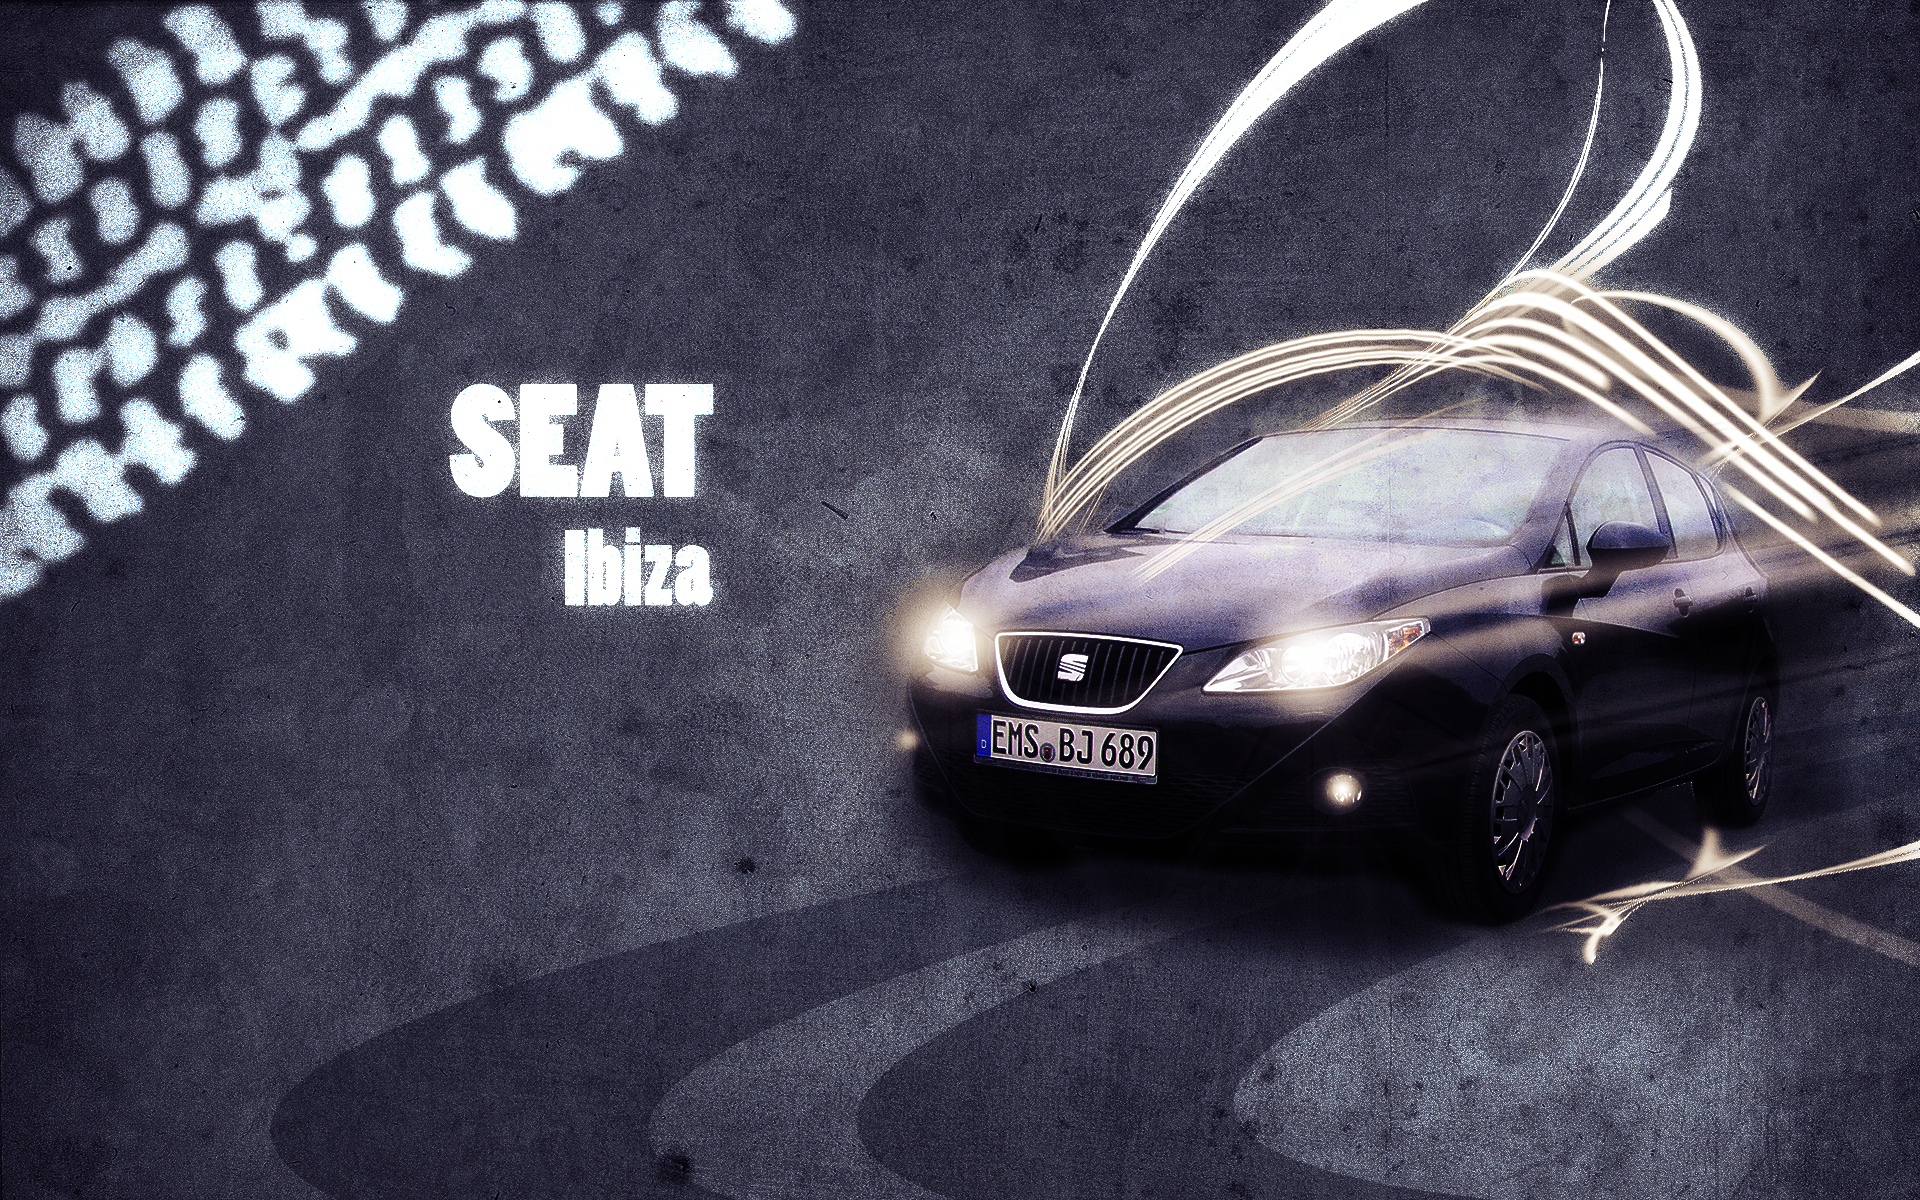 Seat Ibiza 6j - Wallpaper